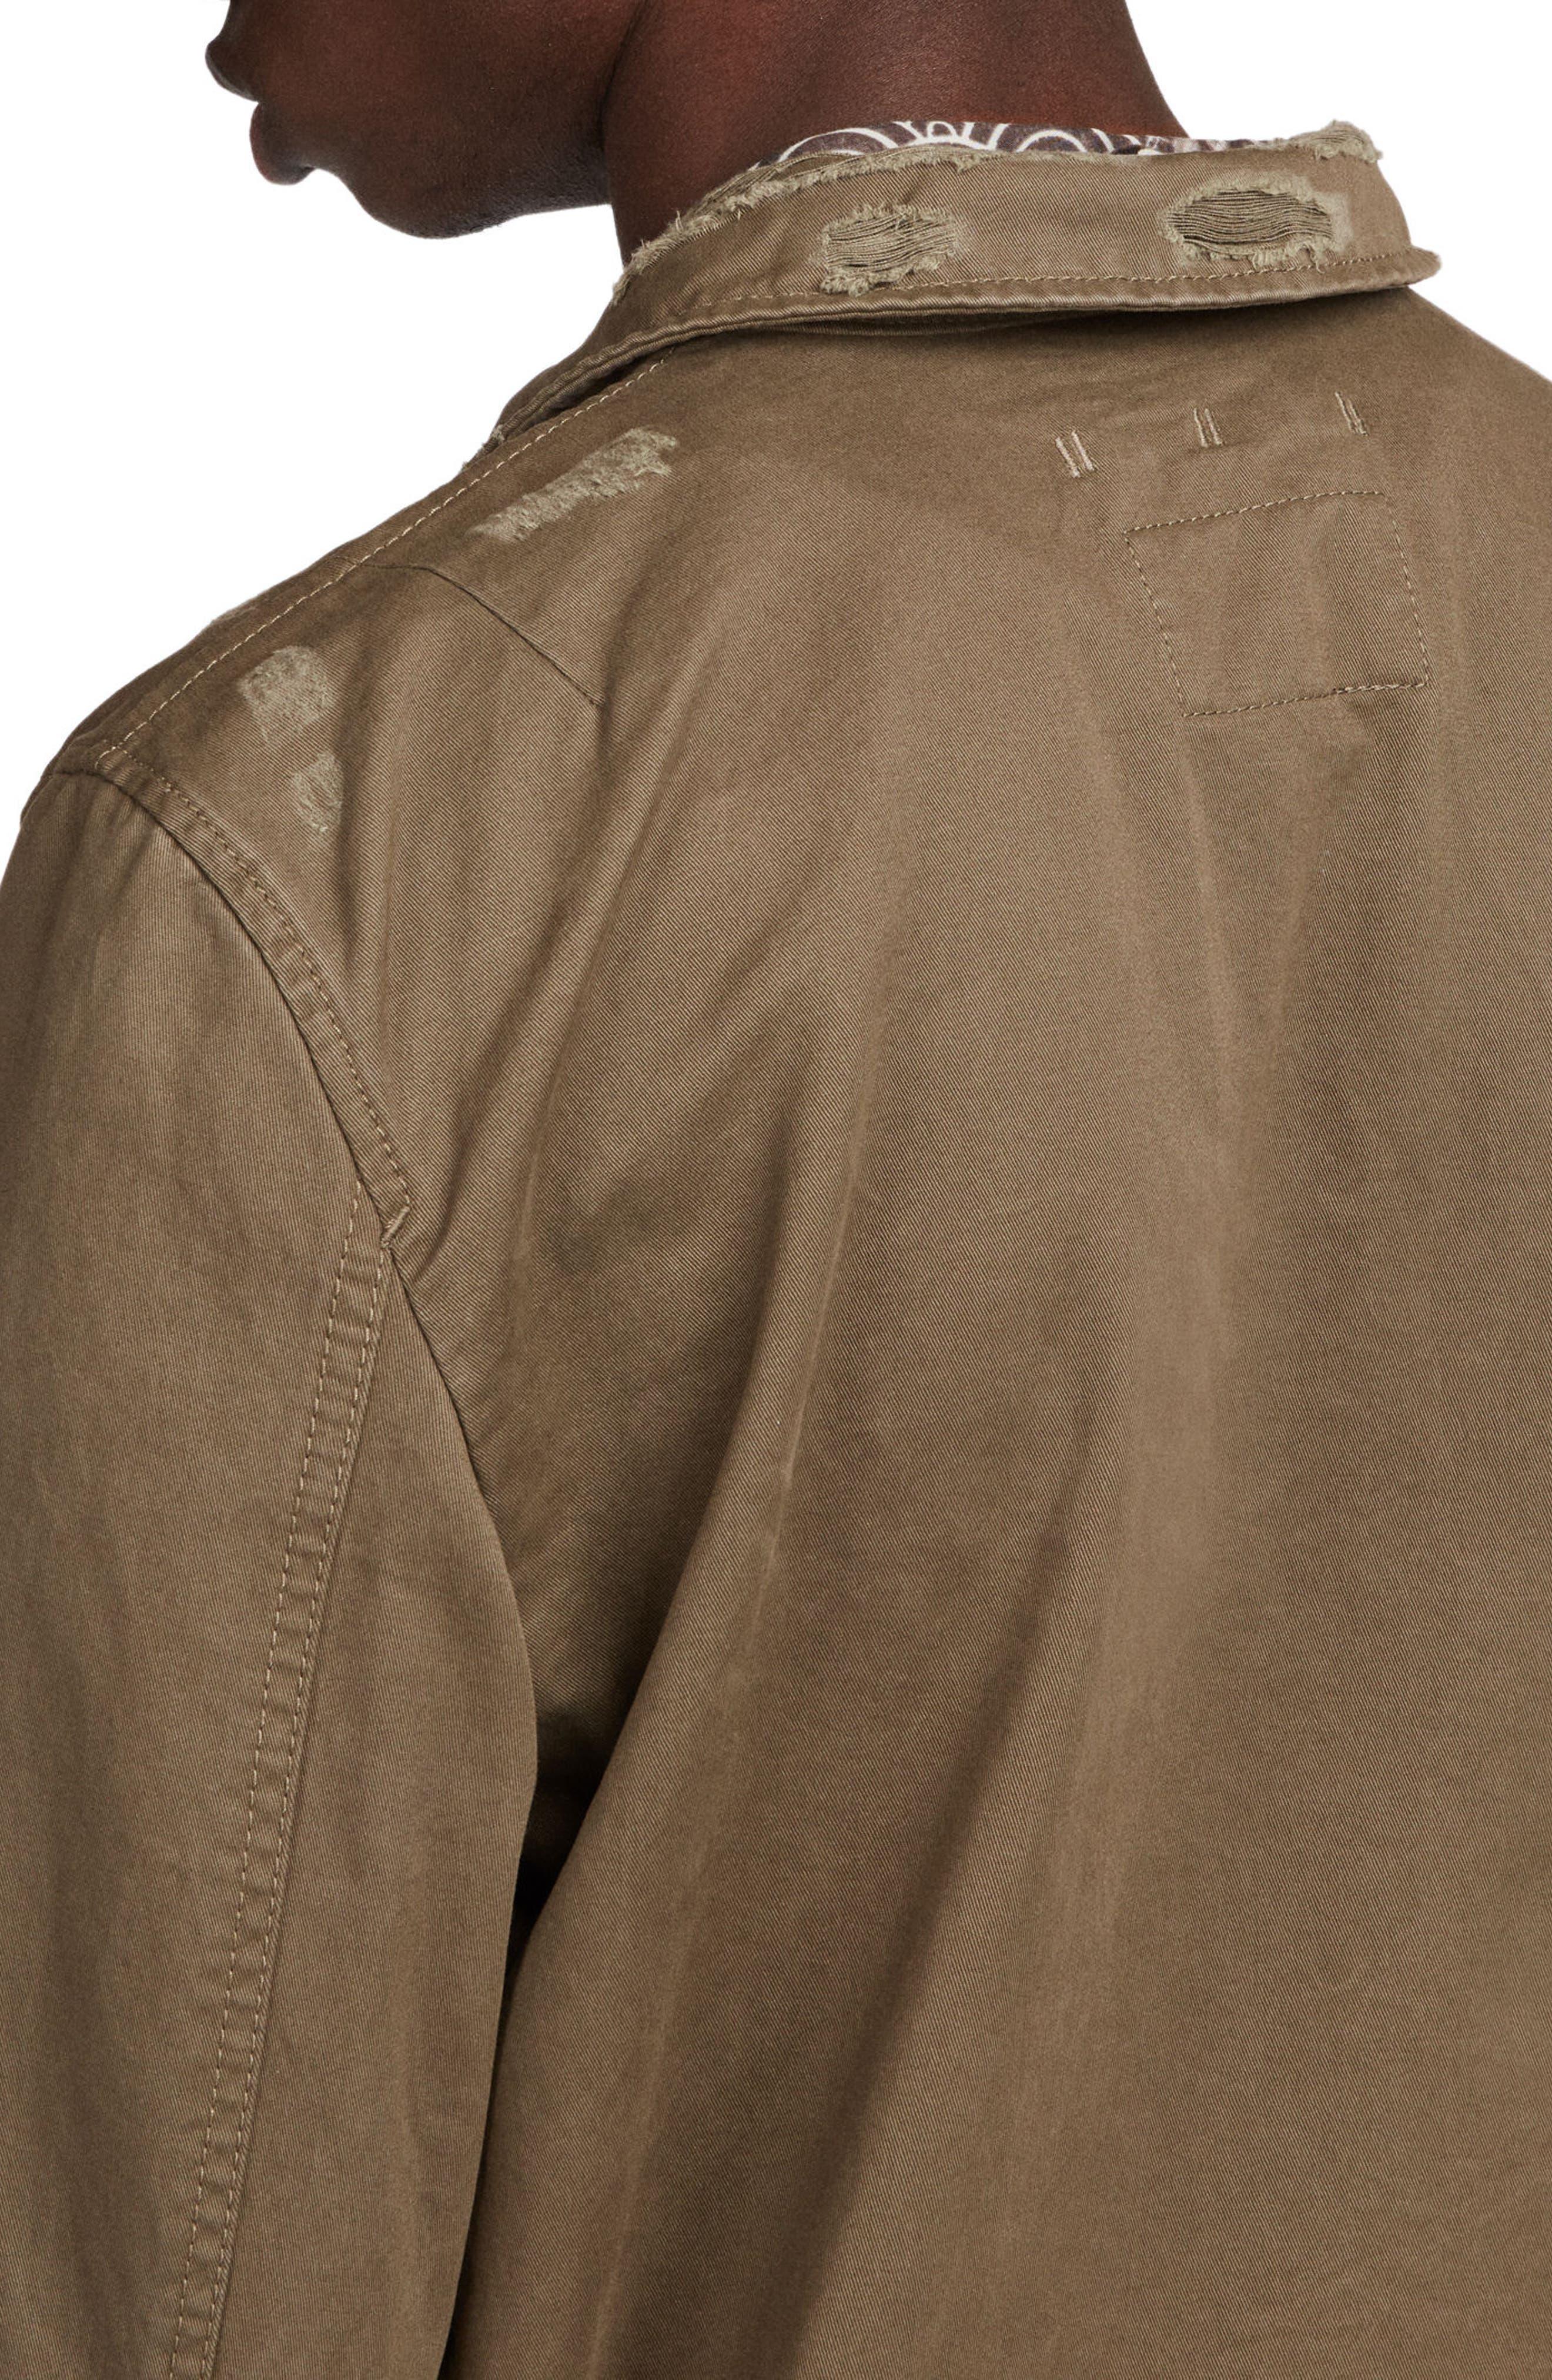 Sasaki Shirt Jacket,                             Alternate thumbnail 3, color,                             Khaki Green